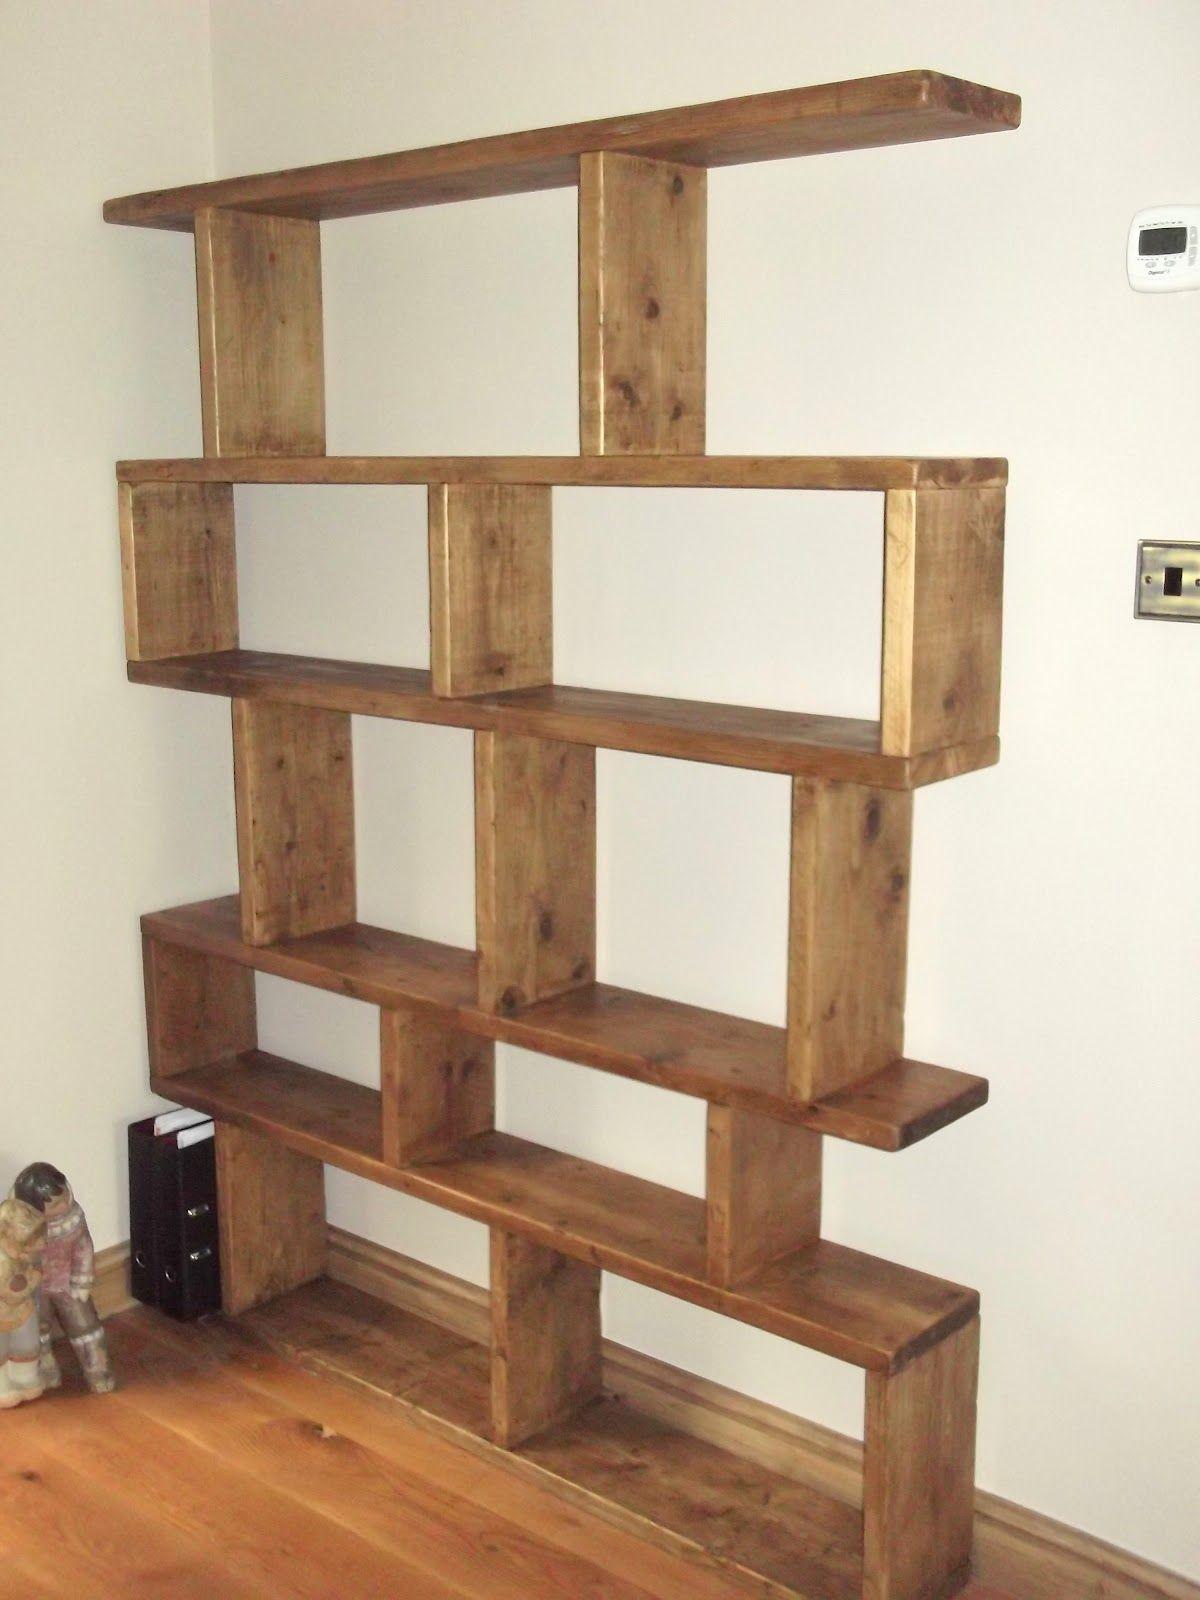 Apartment Storage Ideas Vertical Space More Free Standing ShelvesVertical